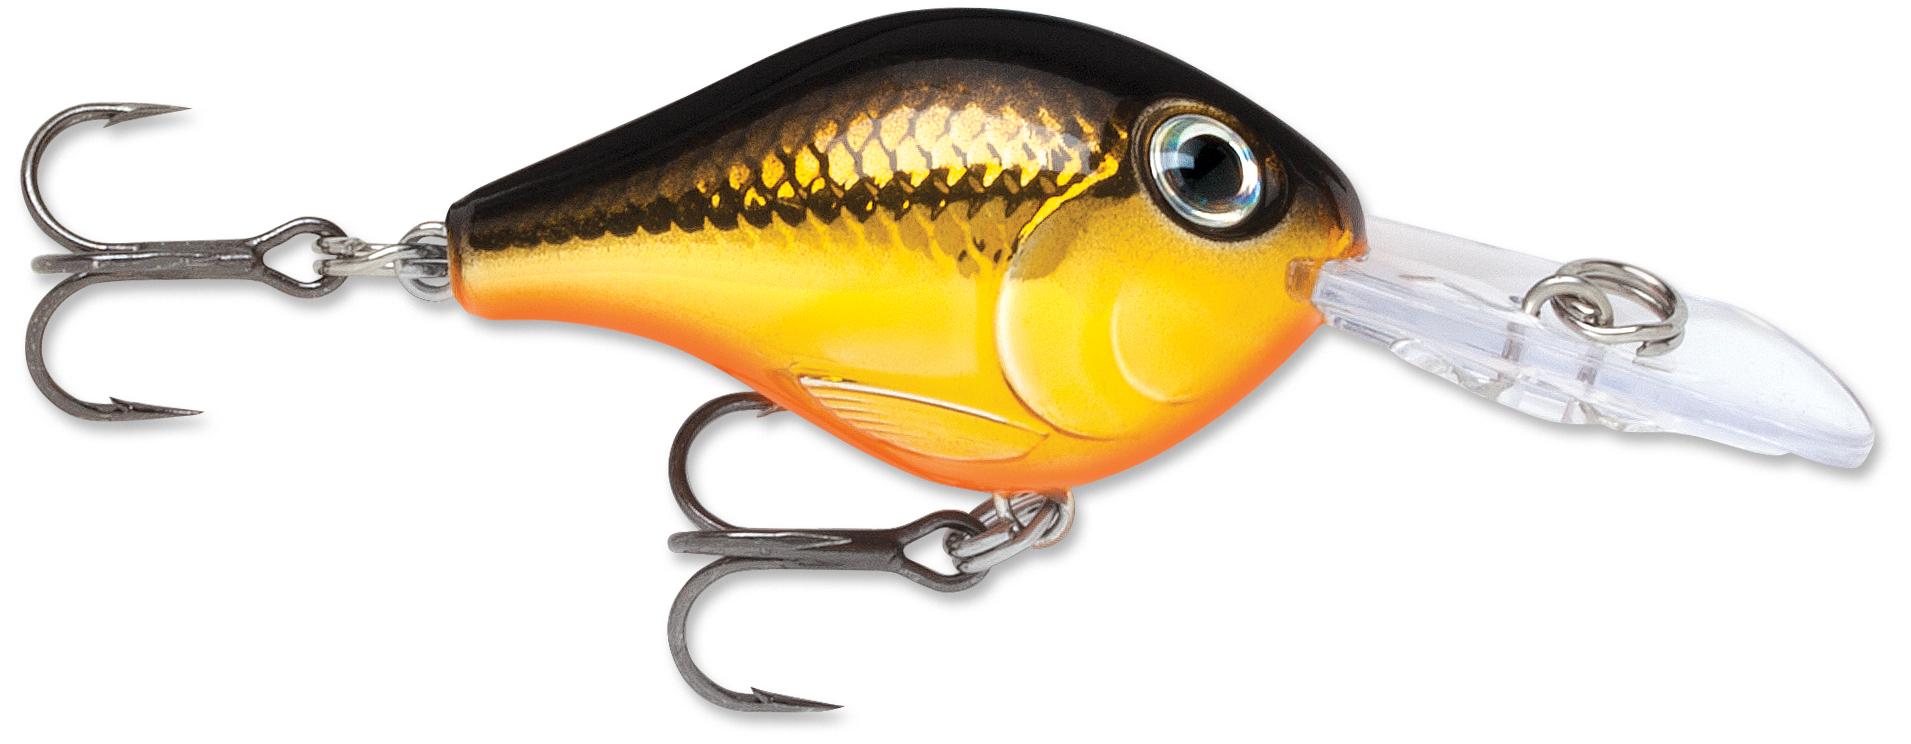 Rapala ulc03 ultra light crank kabele 39 s trading post for Rapala fishing lures